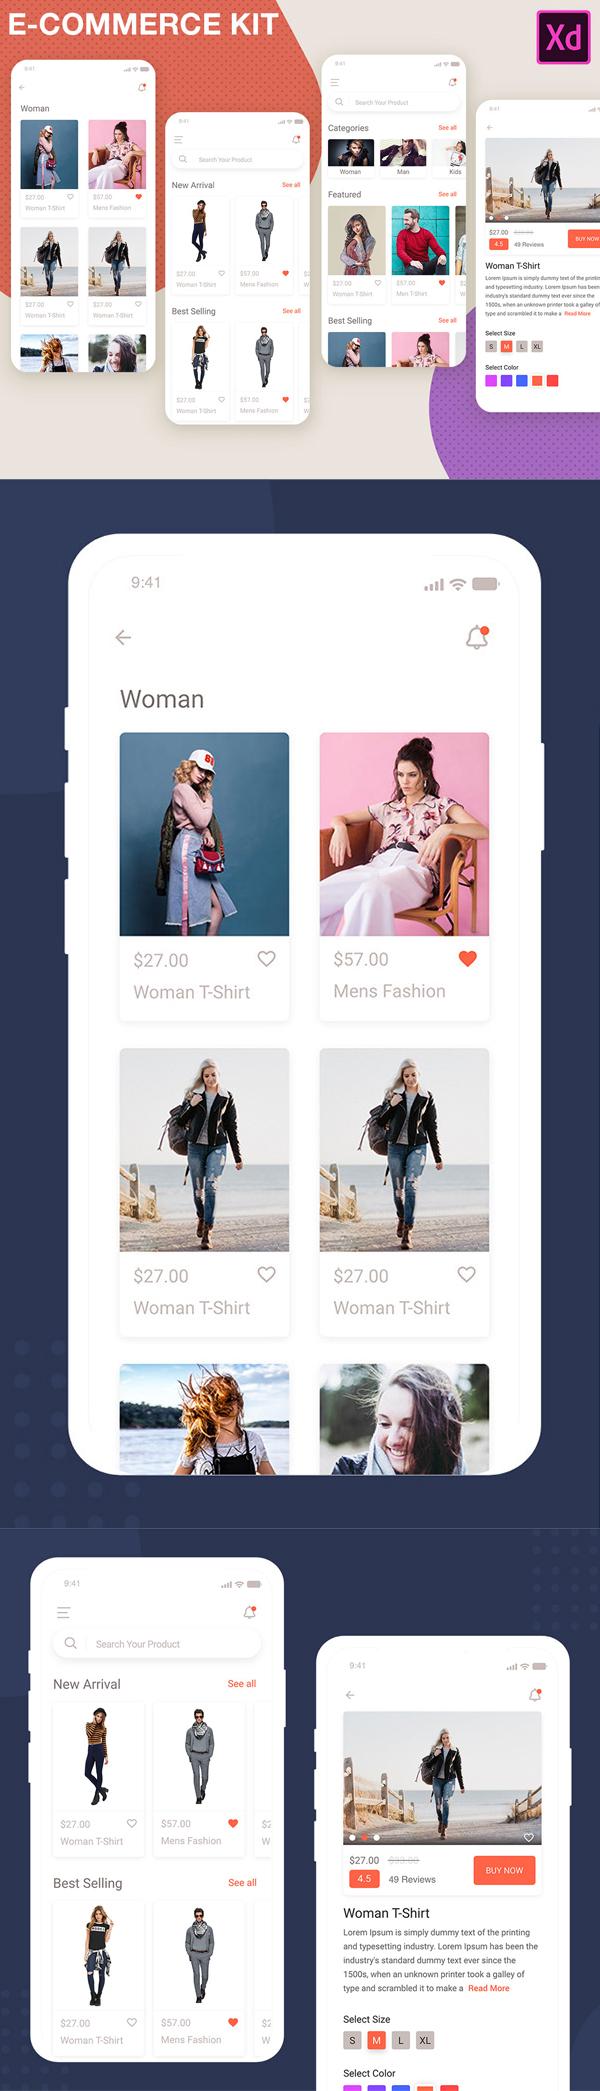 Freebies for 2019: New iOS 12 E-Commerce App UI Kit